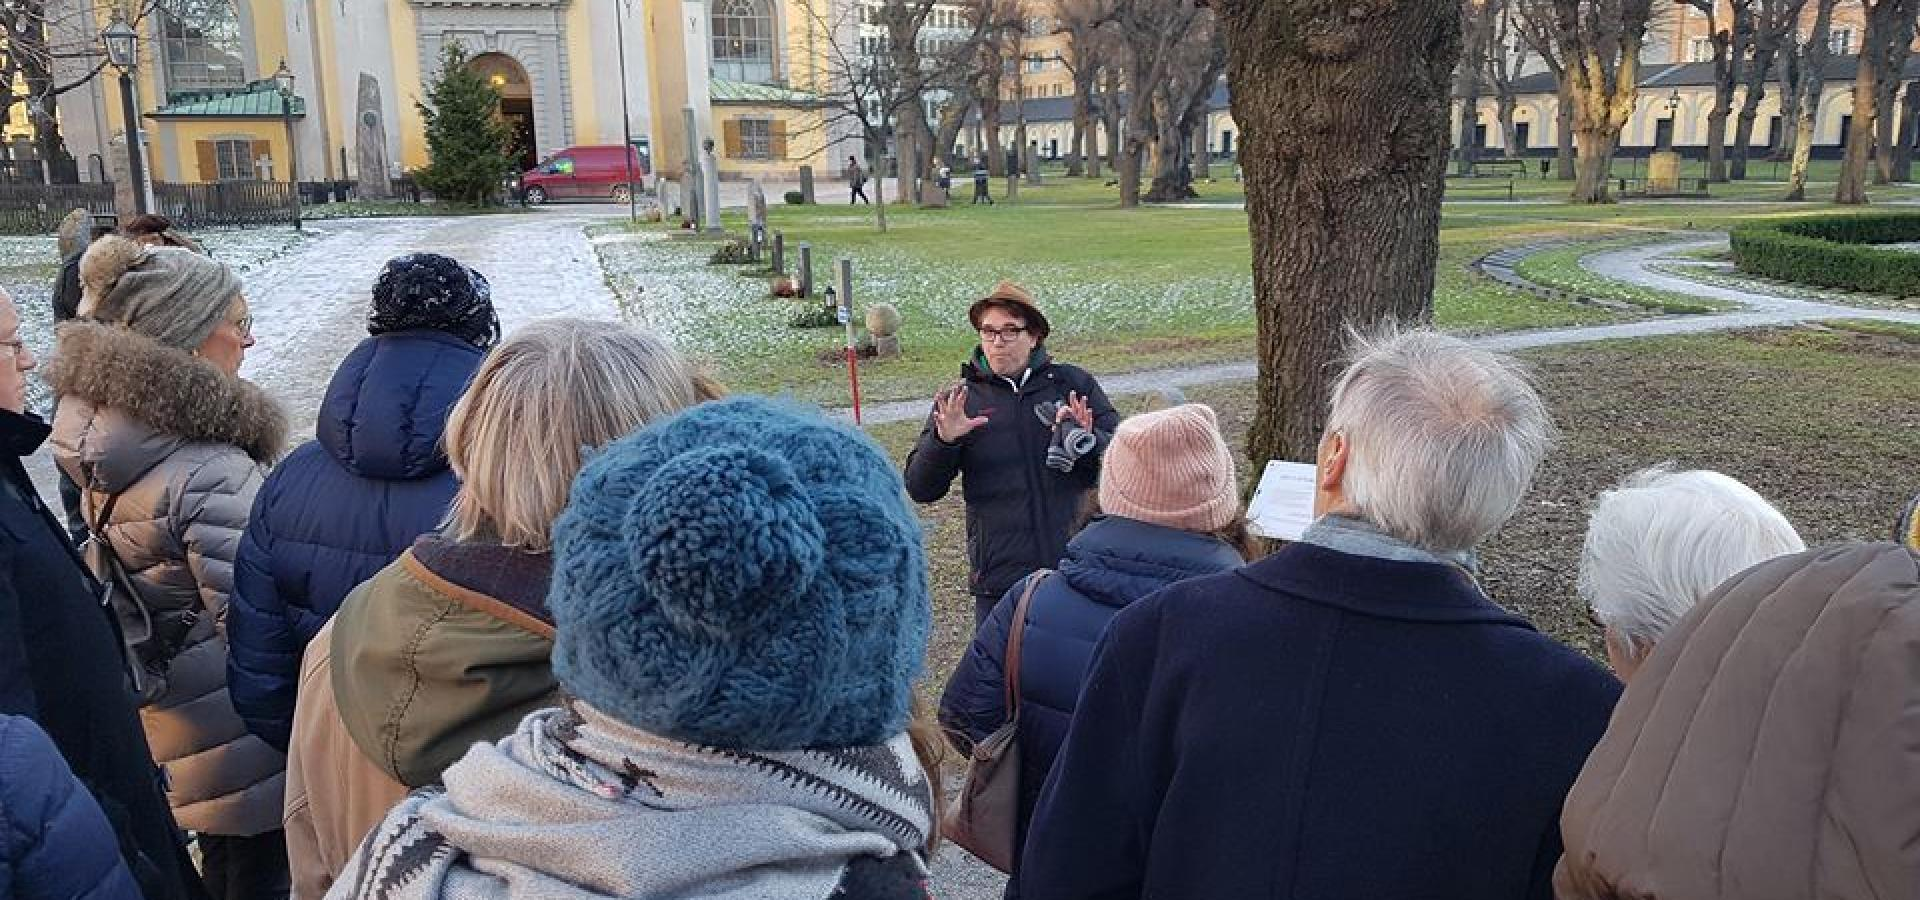 Dejt aktiviteter i skultuna - Agriturismo Pingitore